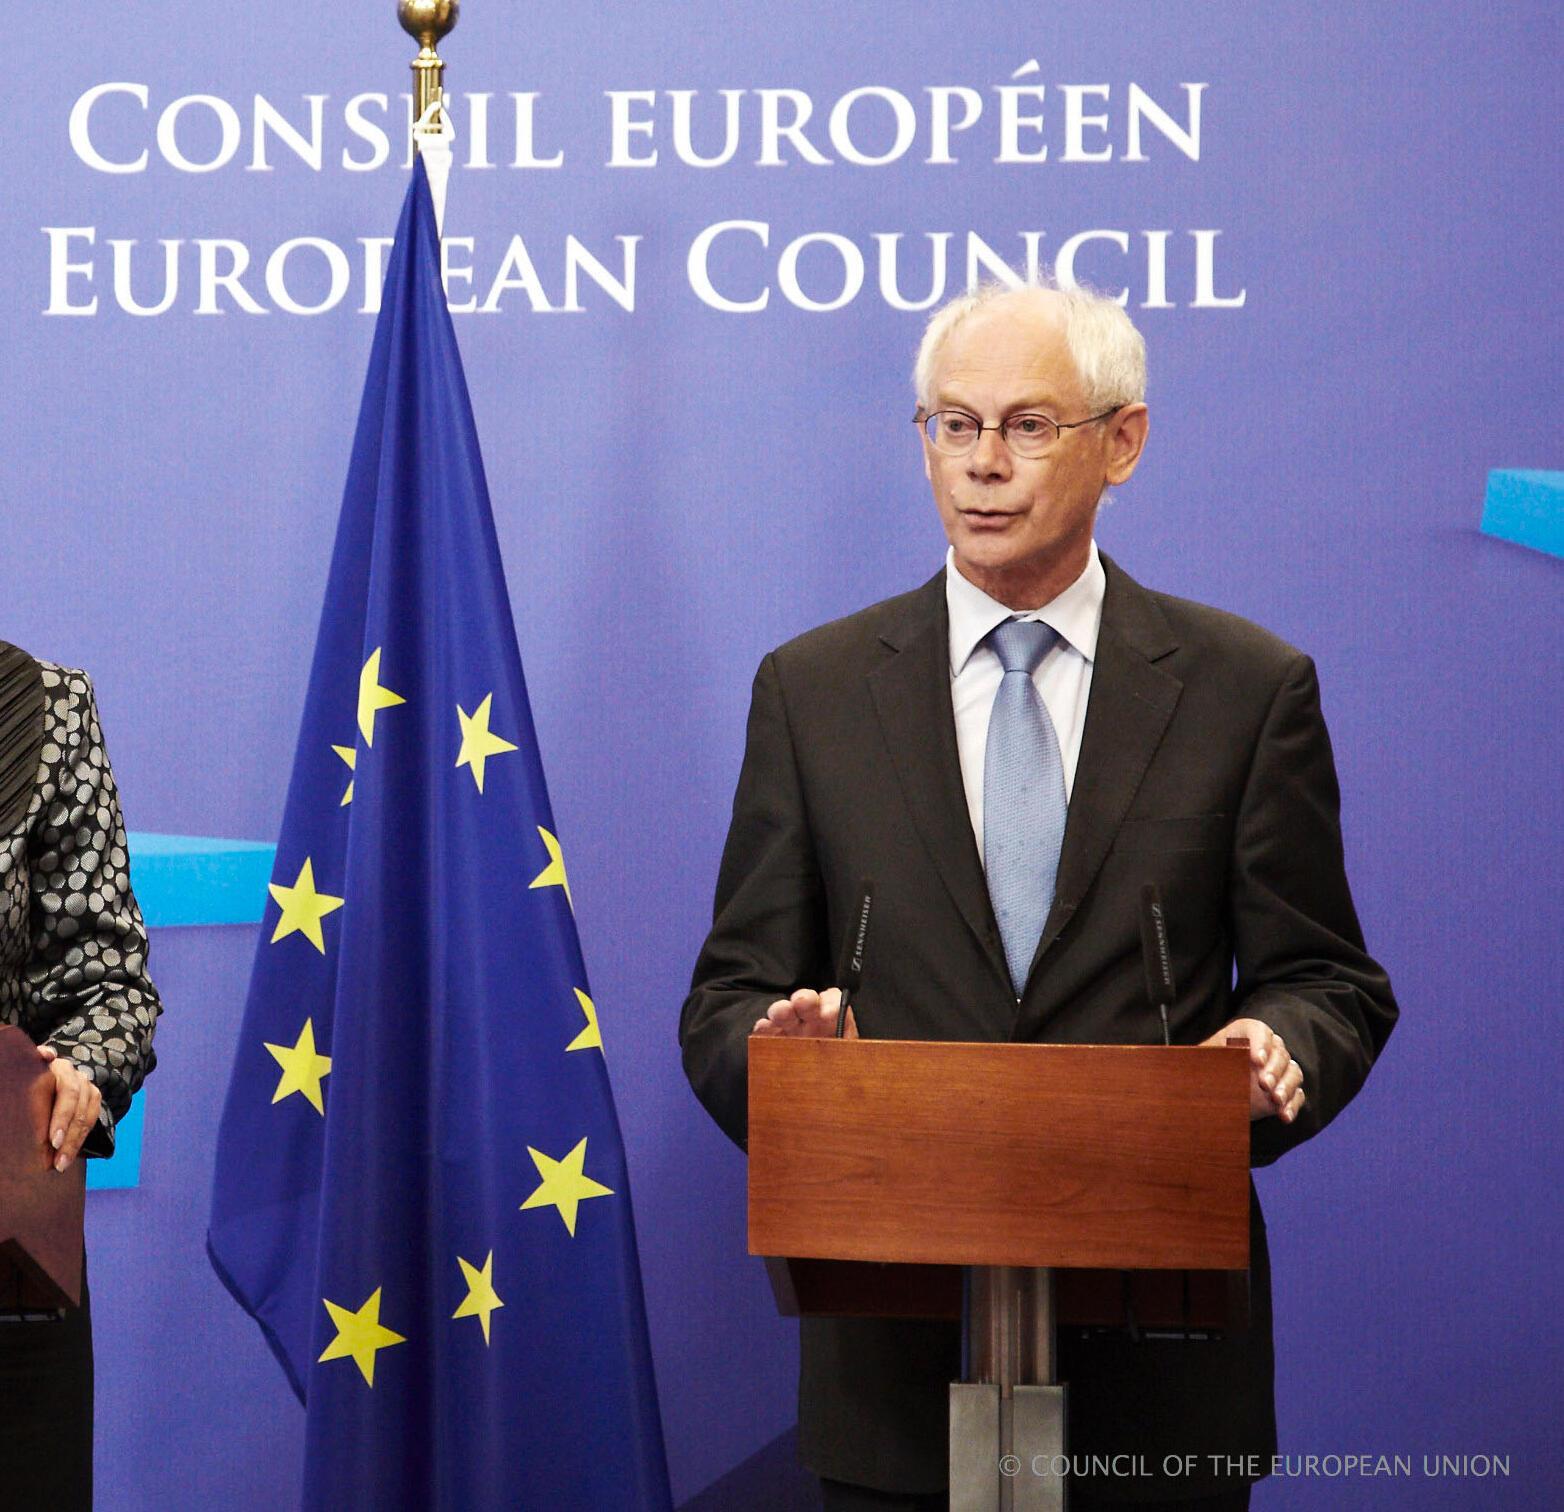 O presidente do Conselho Europeu, Herman van Rompuy